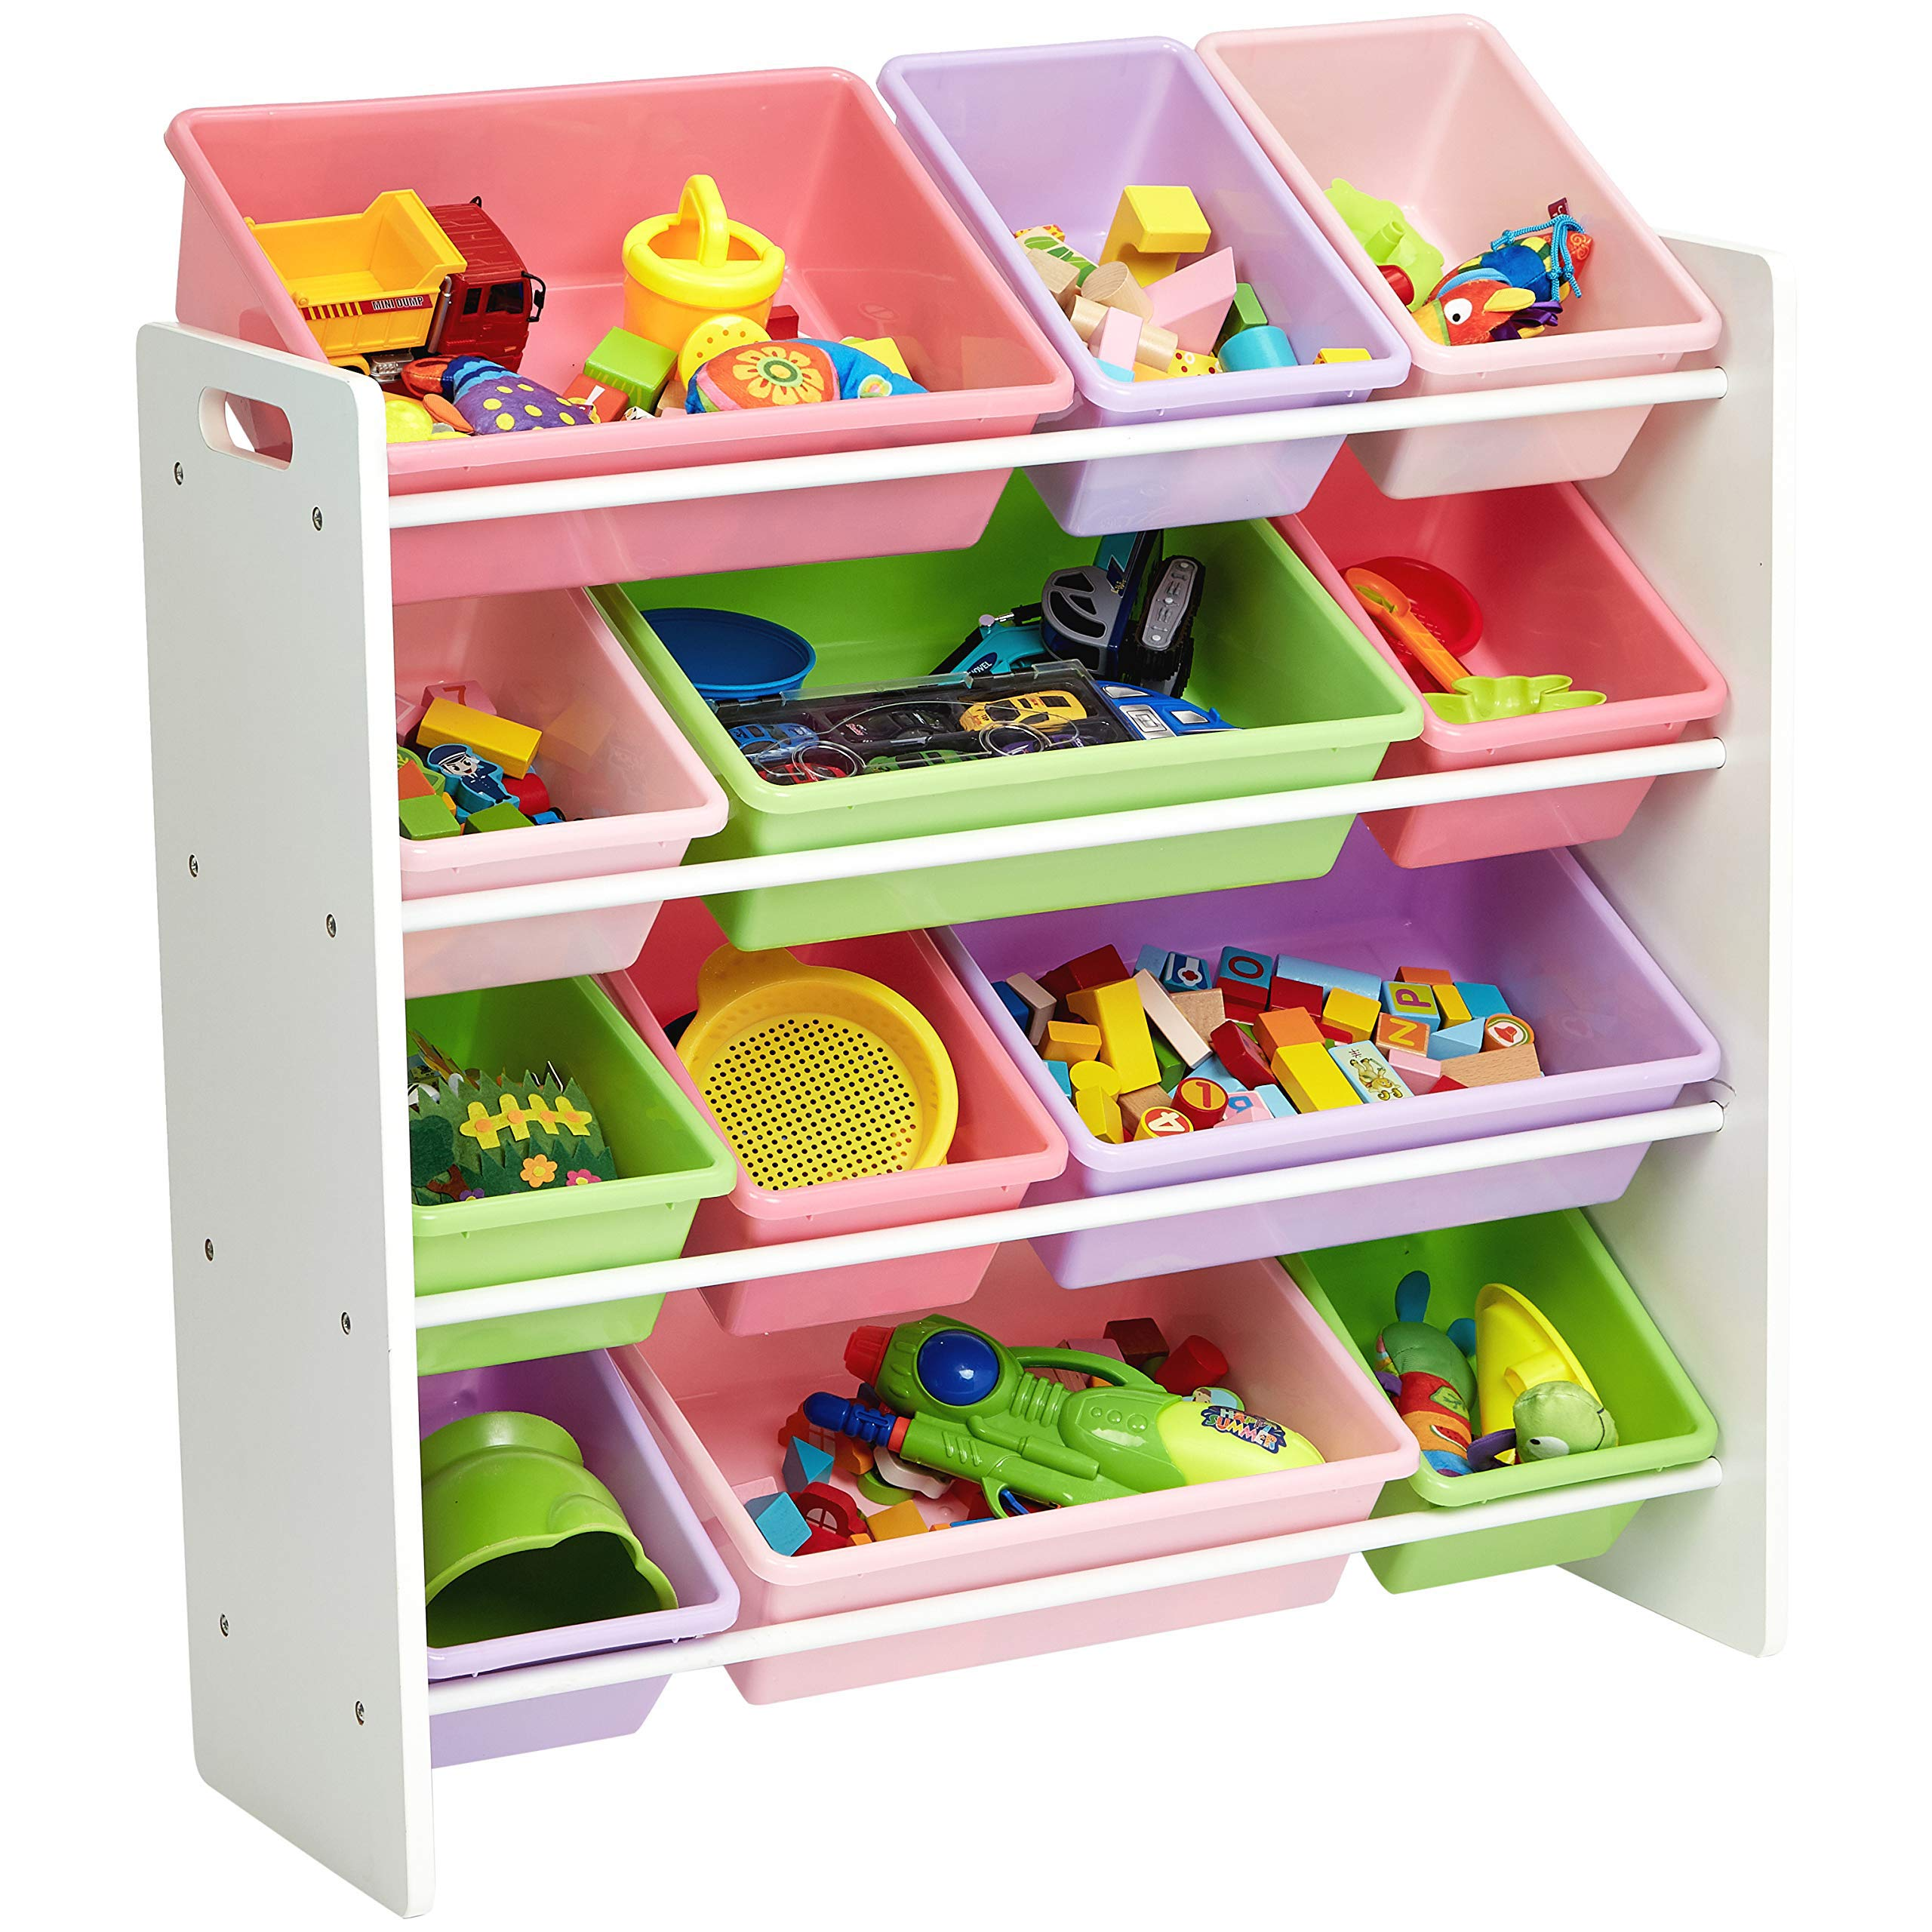 AmazonBasics Kids Toy Storage Organizer Bins - White/Pastel by AmazonBasics (Image #3)